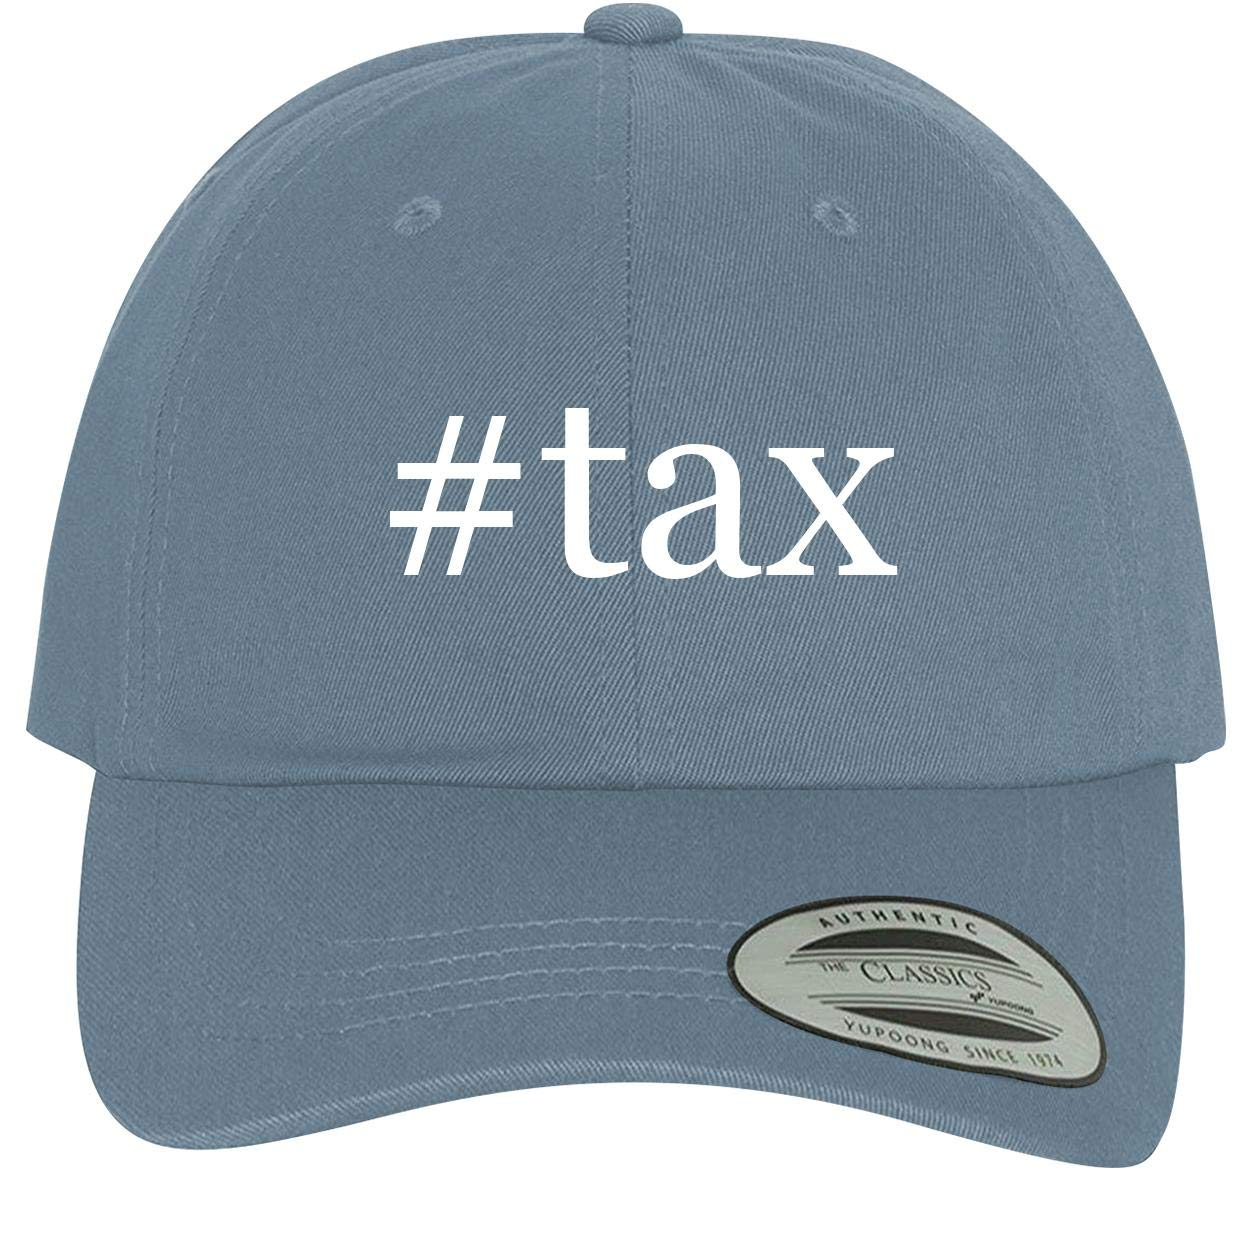 Comfortable Dad Hat Baseball Cap BH Cool Designs #Tax